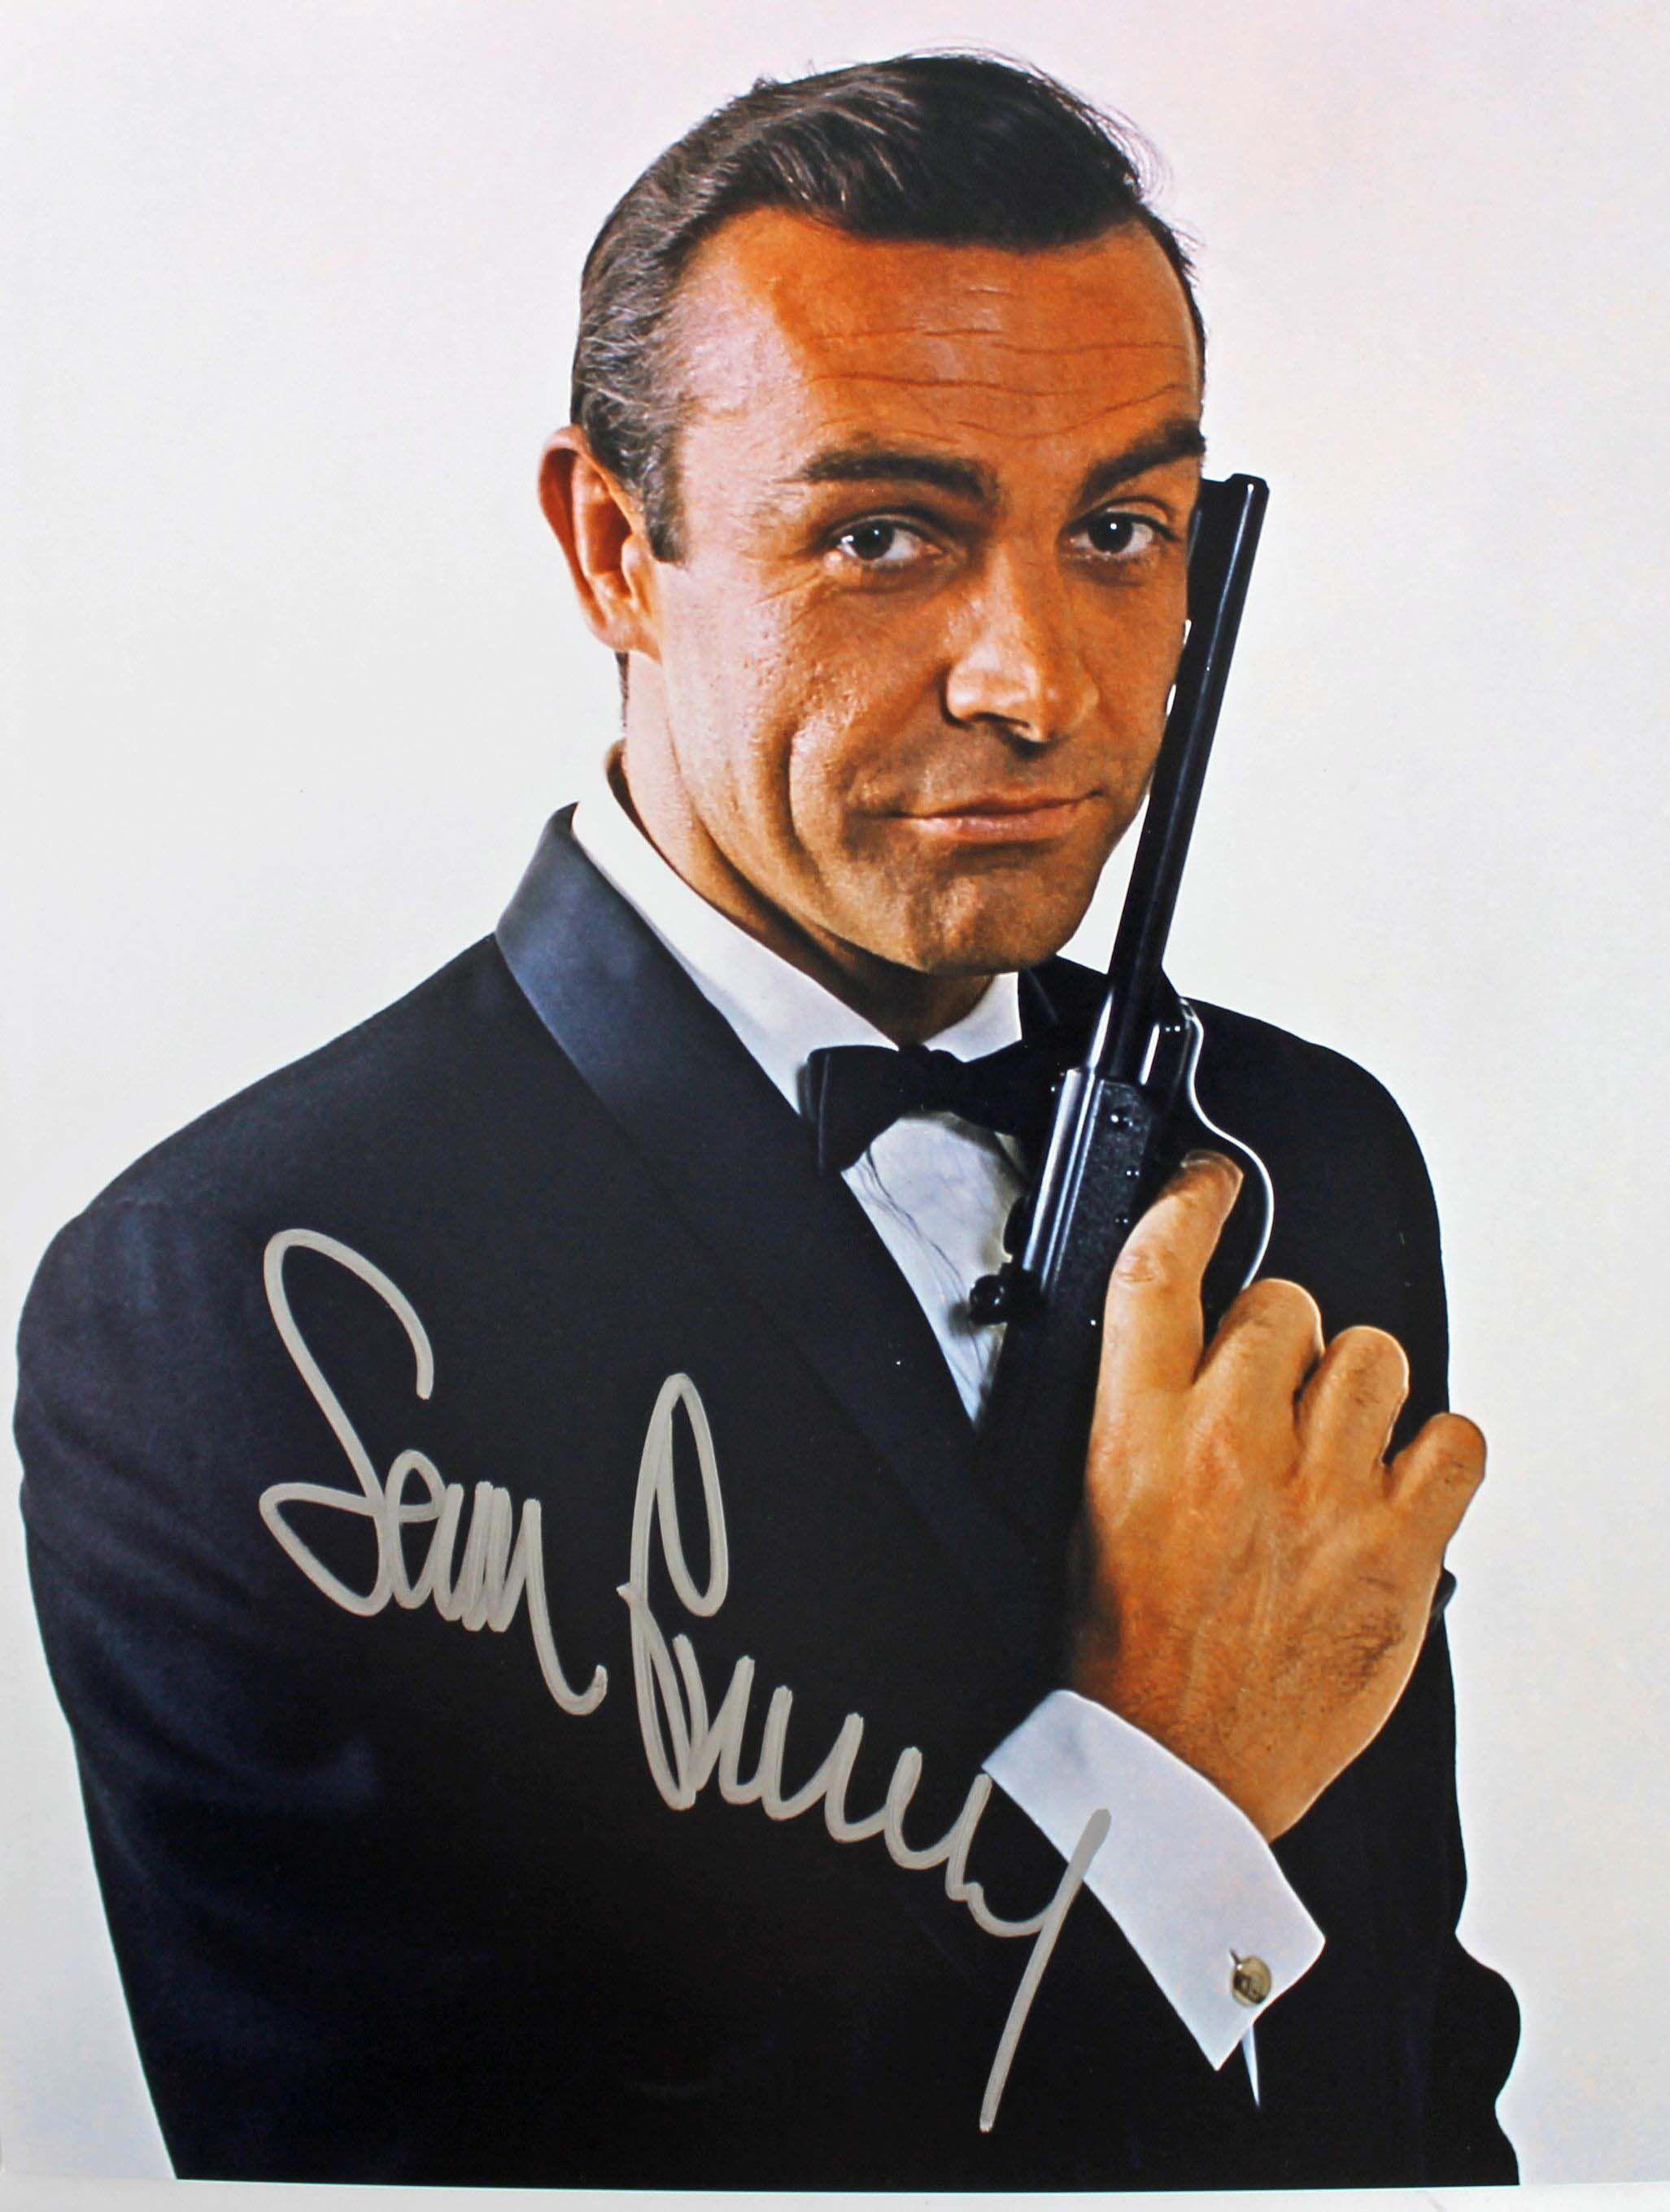 Celebrities James Bond Sean Connery Wallpaper 2053x2719 Cool Pc Wallpapers James Bond Actors Sean Connery James Bond James Bond